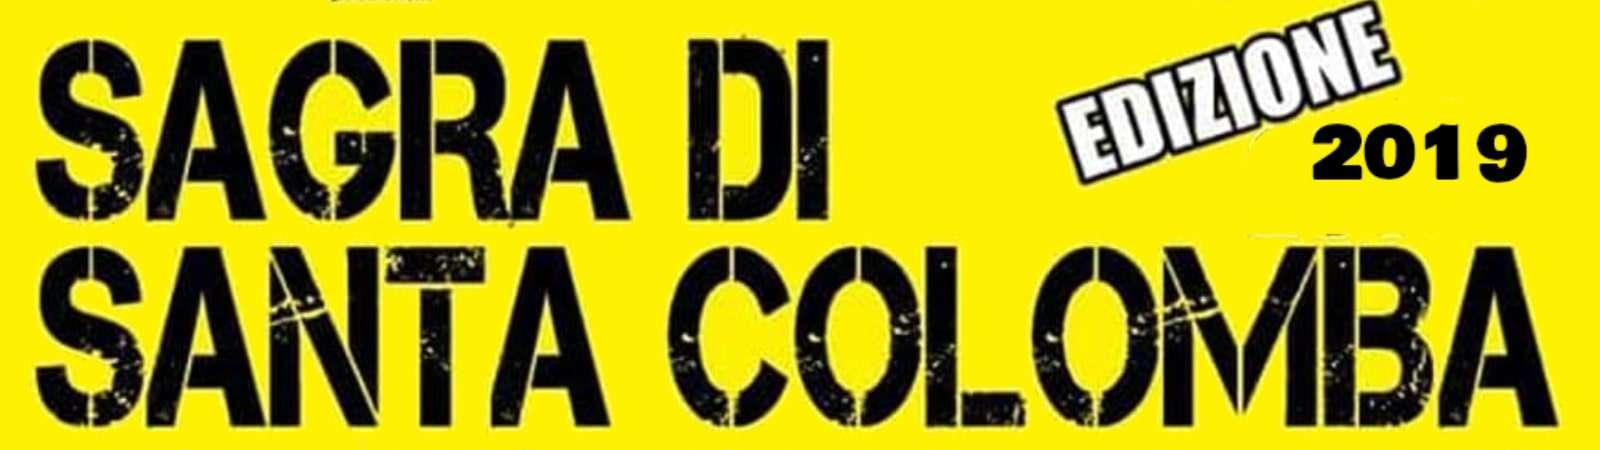 Santa Colomba 2019